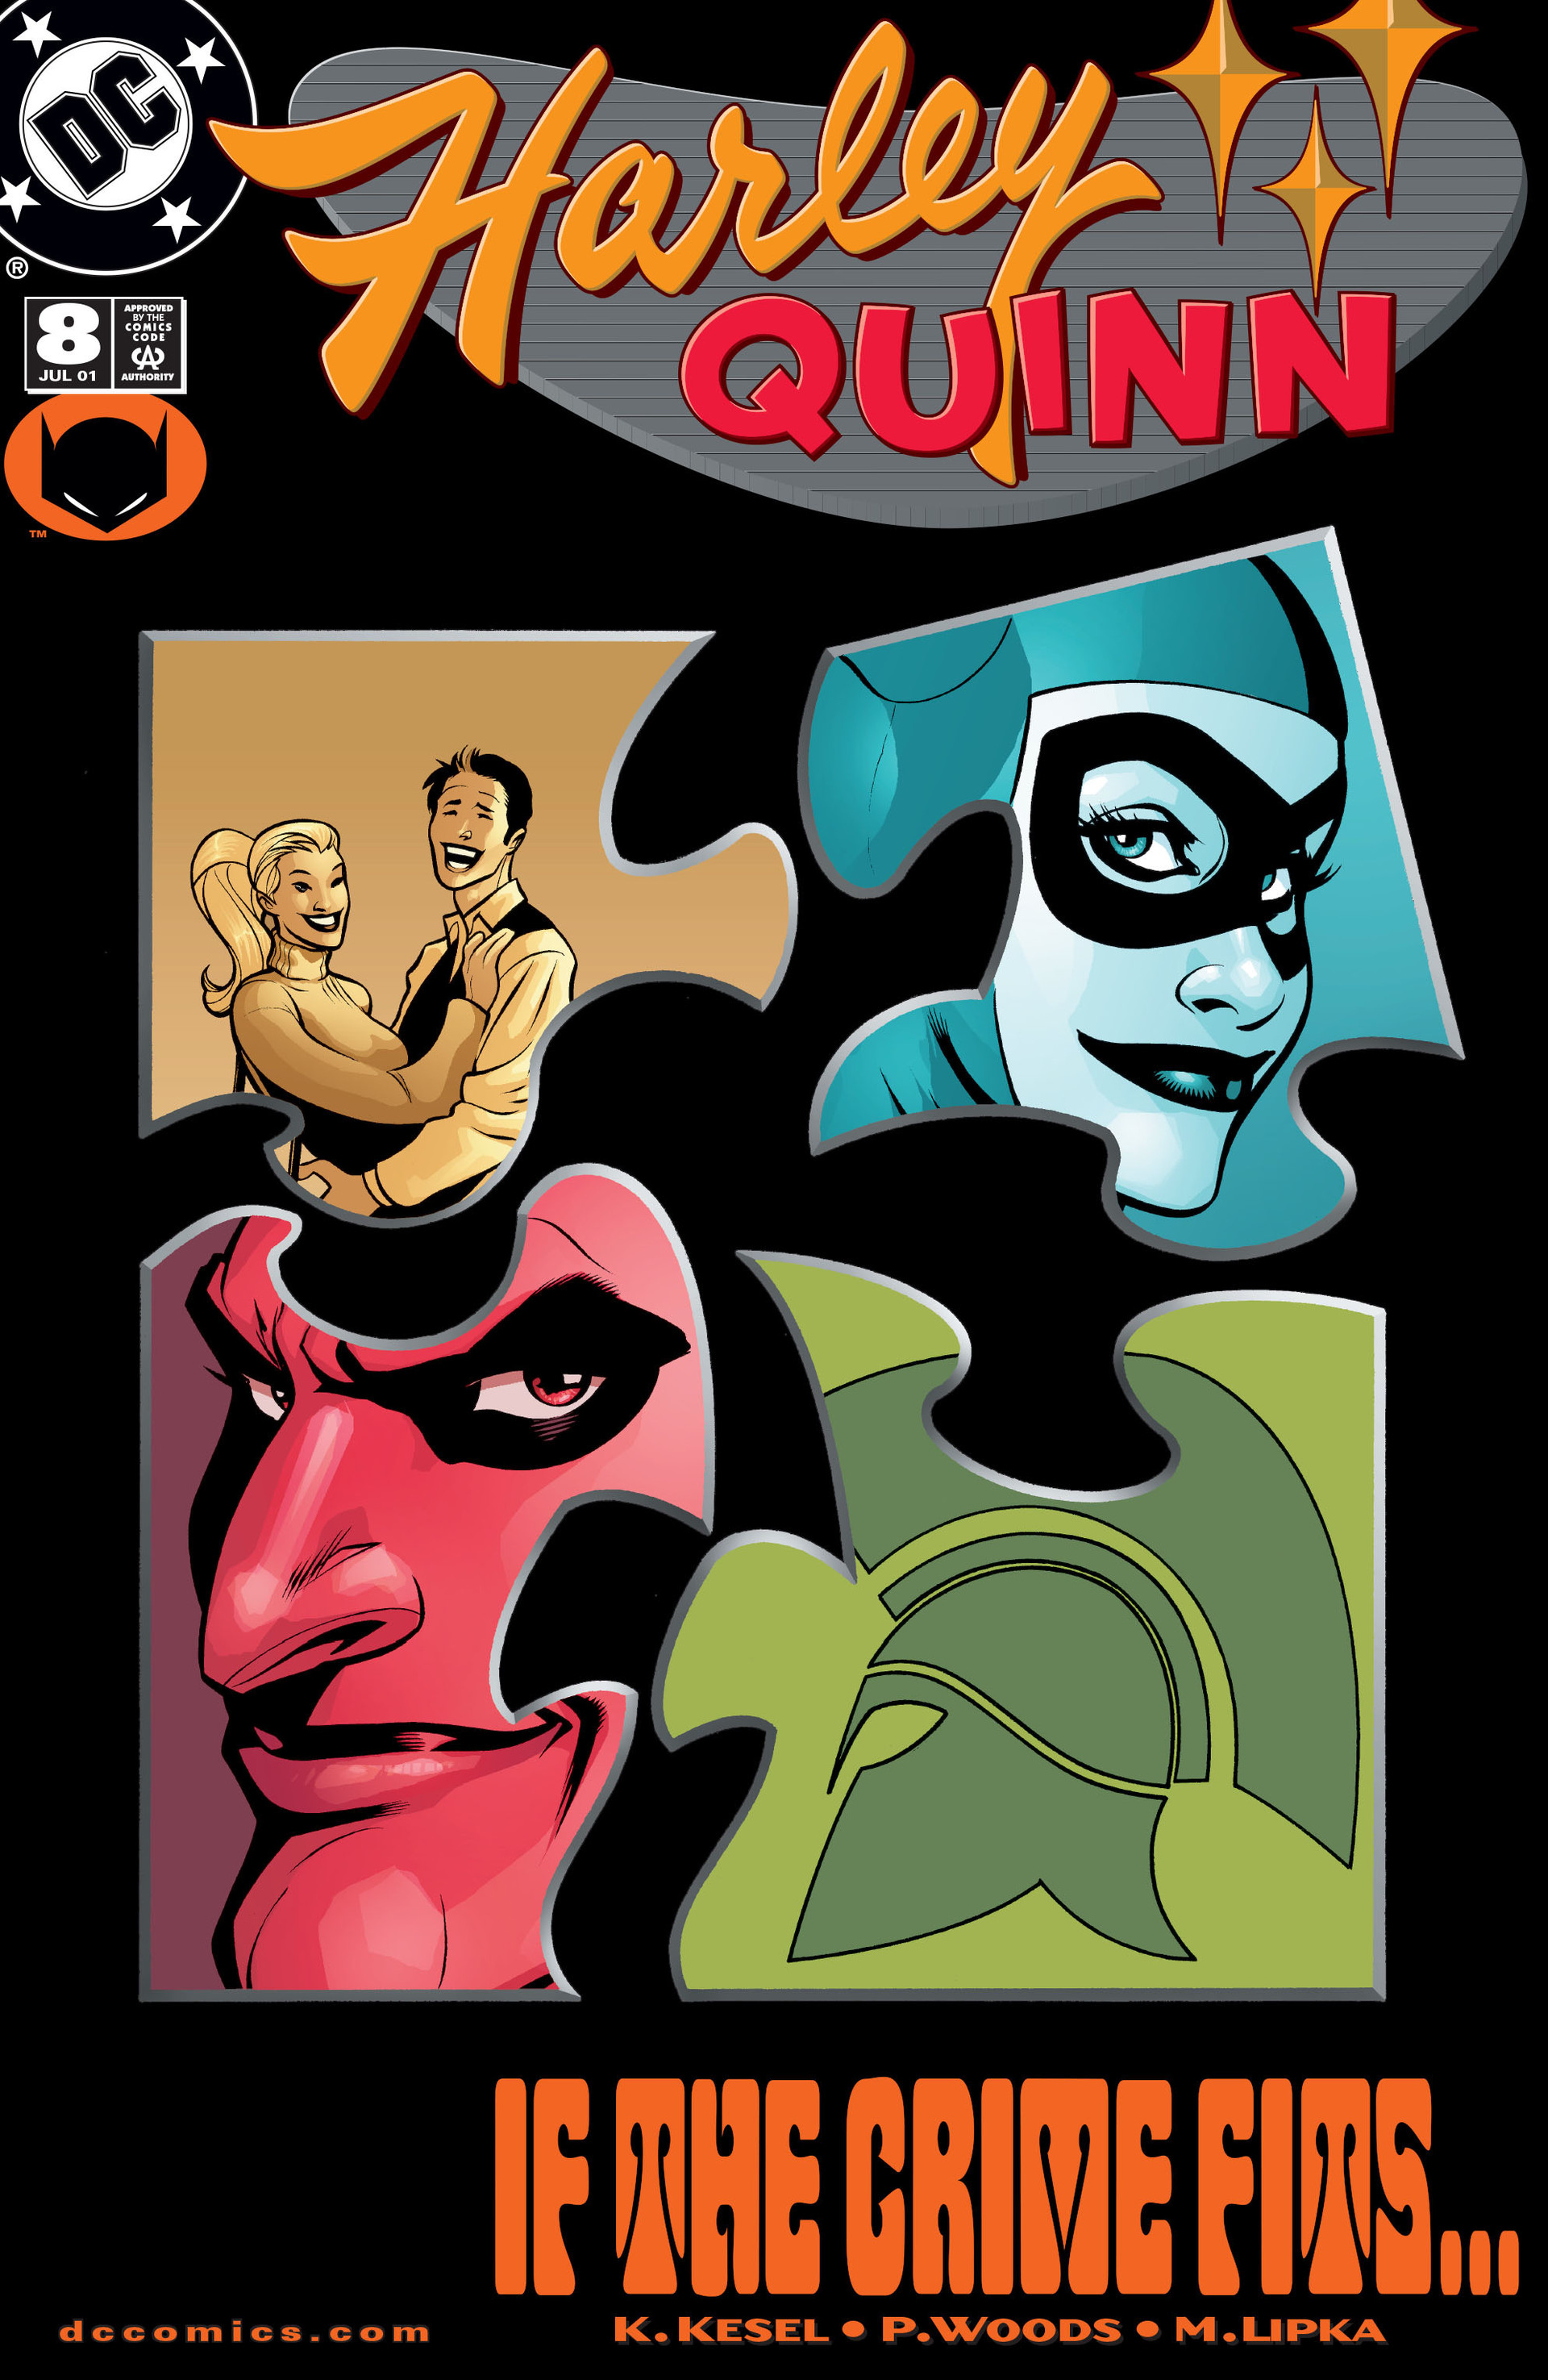 Harley Quinn Vol.1 #8